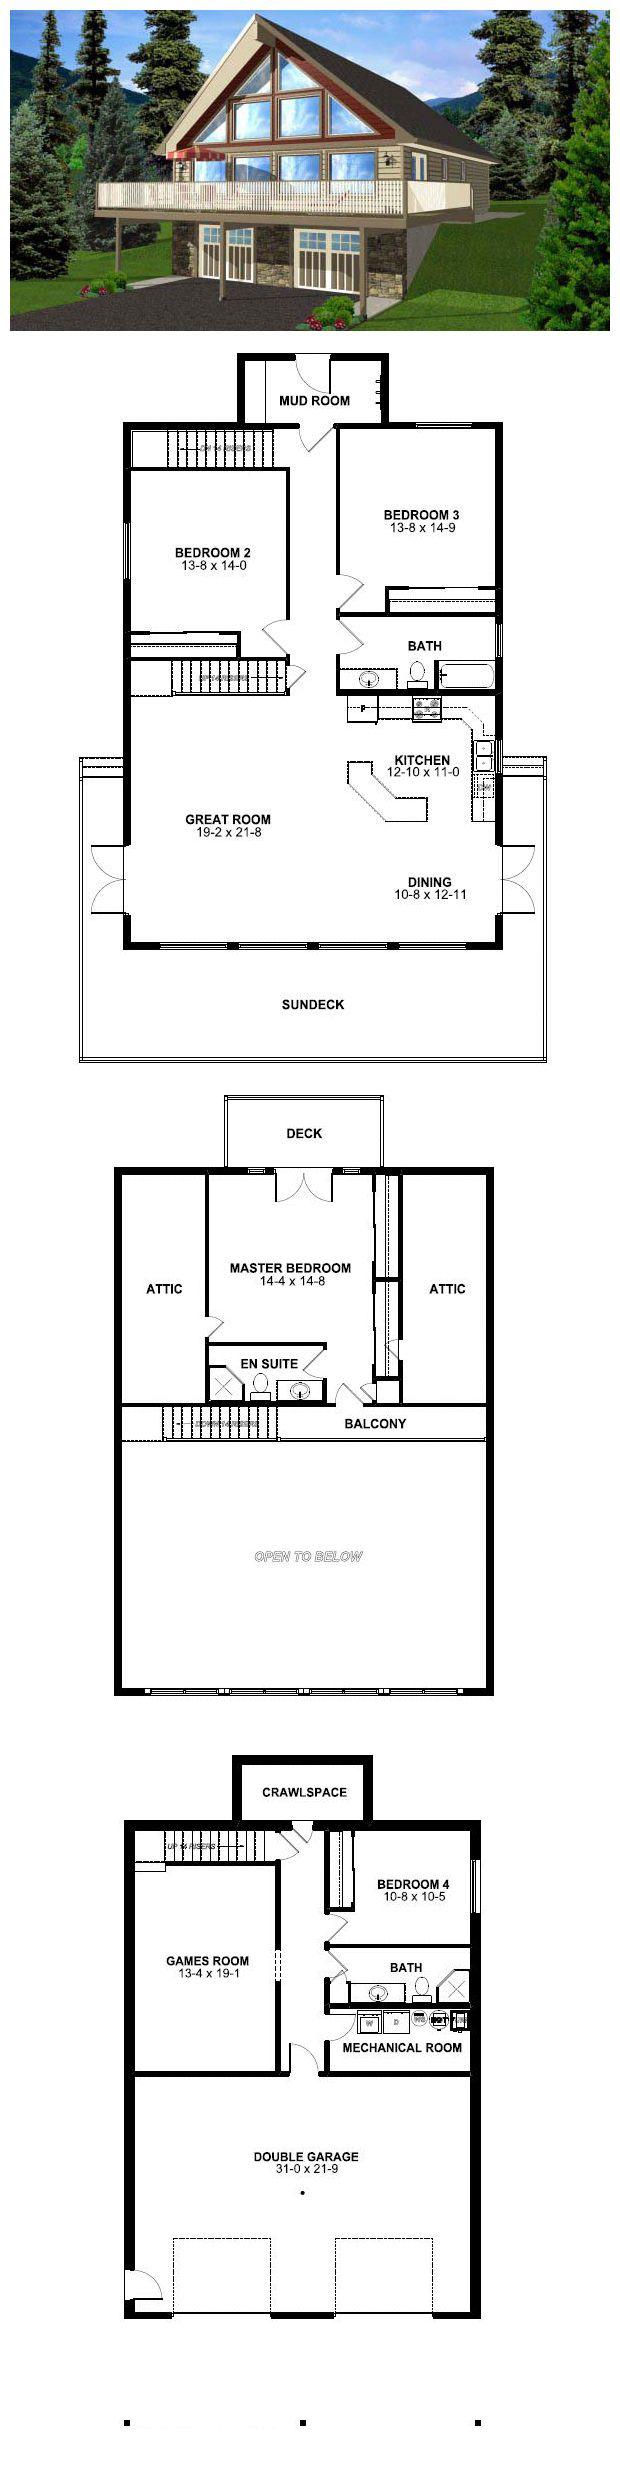 best 25 2 car garage plans ideas on pinterest car garage a frame house plan 99976